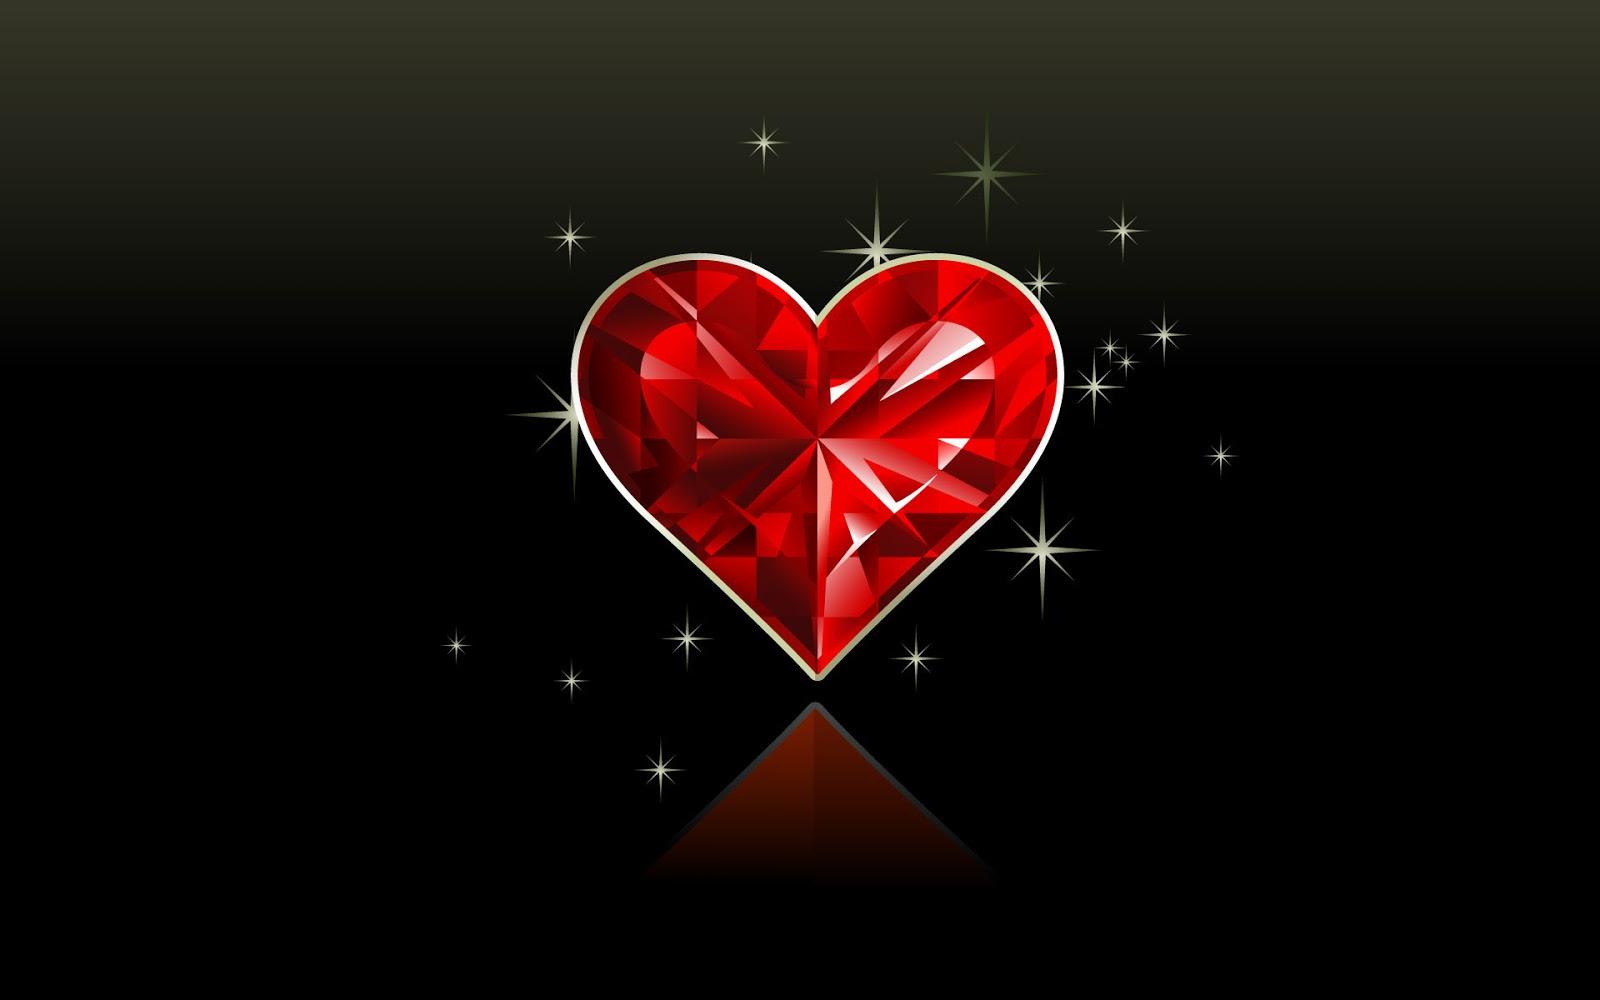 http://3.bp.blogspot.com/--AcH6LiBrWg/UP36g6yBu0I/AAAAAAAAEB0/pj0V4z4bA2Q/s1600/Love_love-wallpaper.jpg